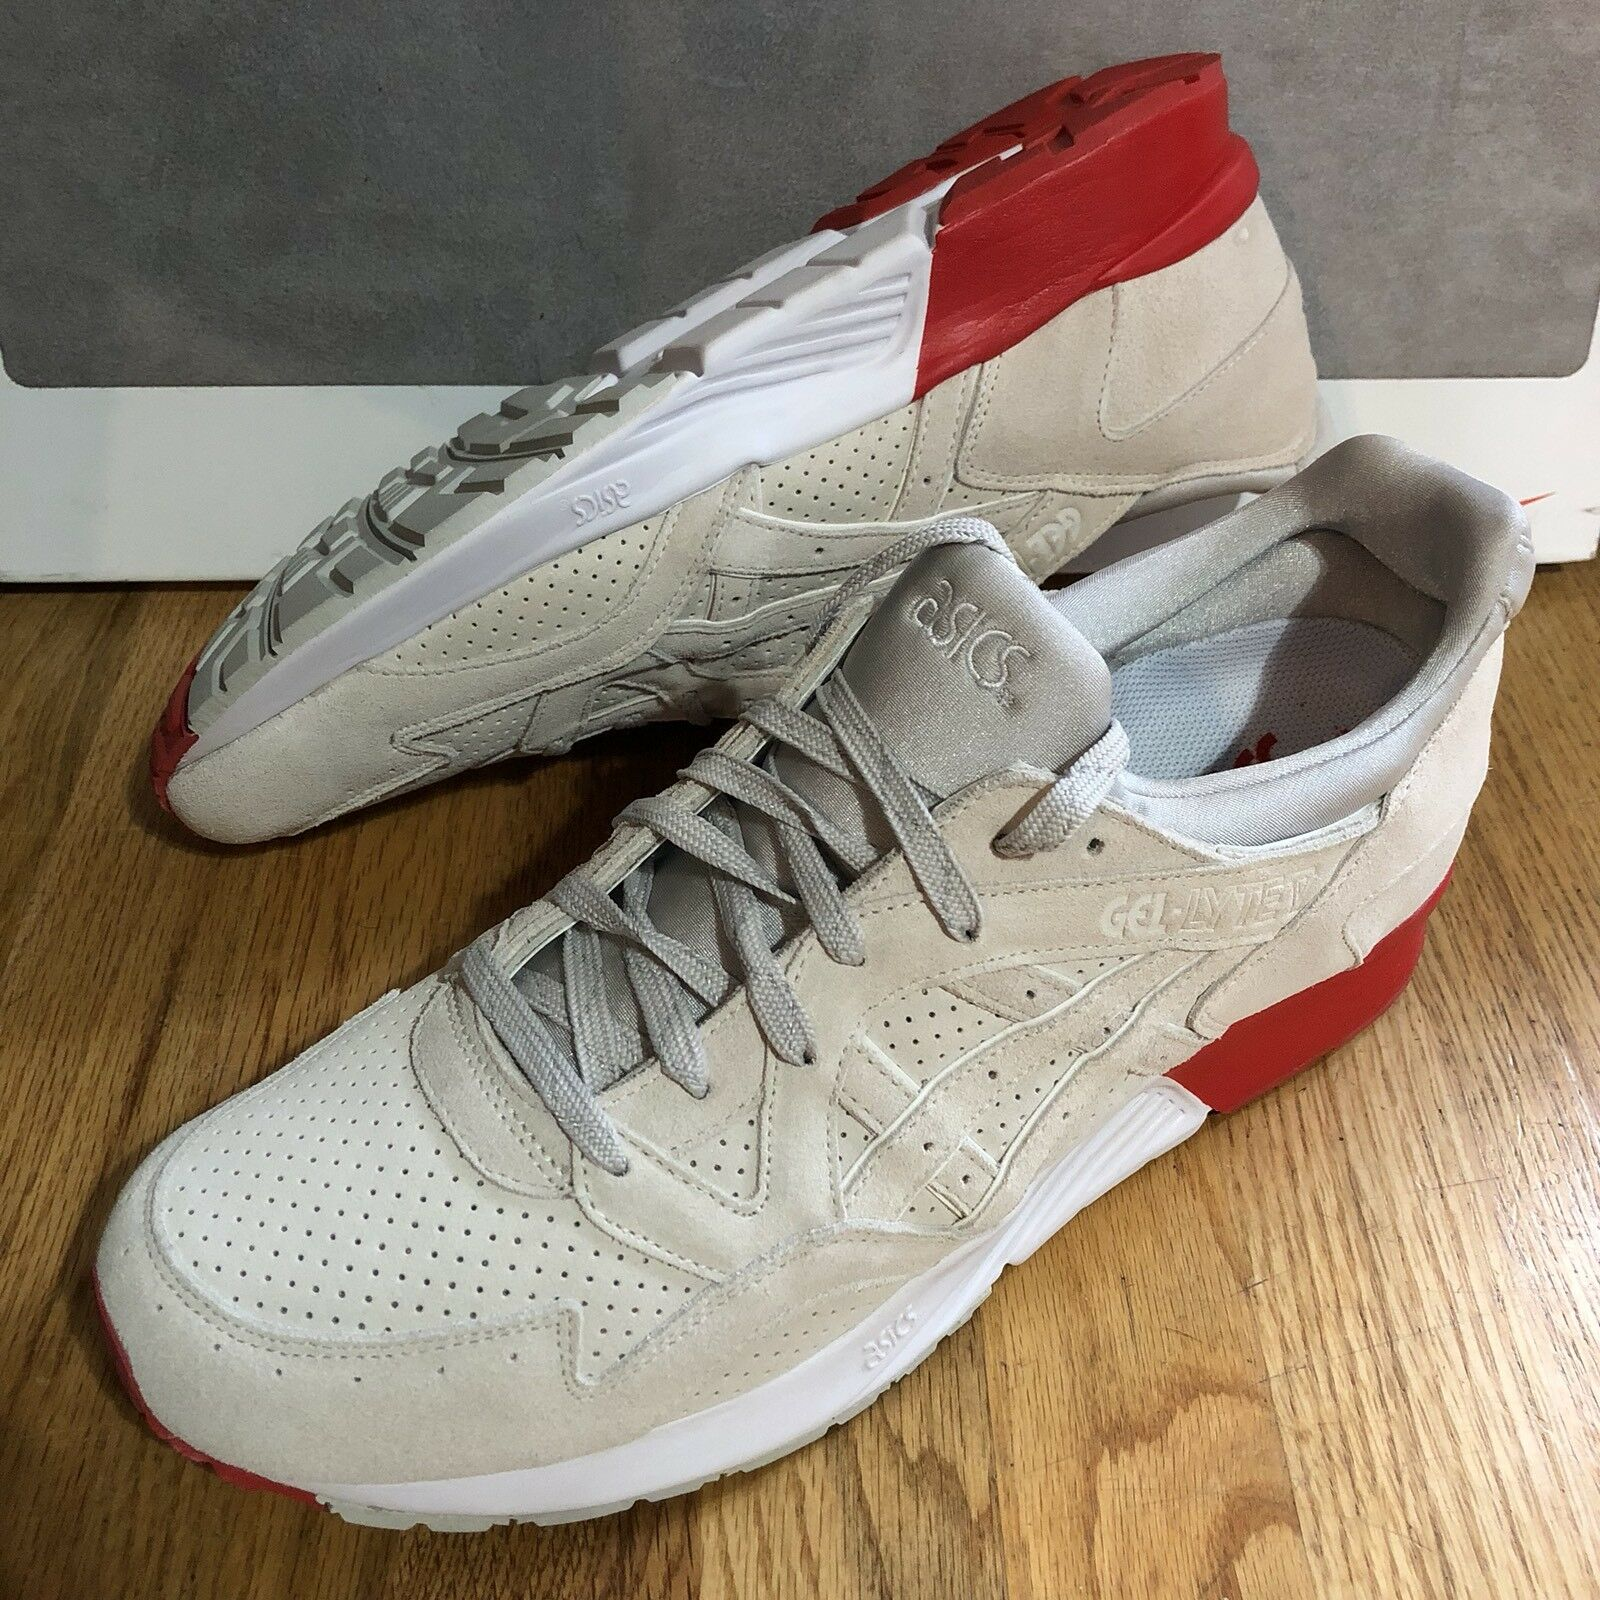 Cocaine Cobra Asics Gel Lyte Homme Taille 13 FonctionneHommest Chaussures De Sport Rouge Blanc Neuf